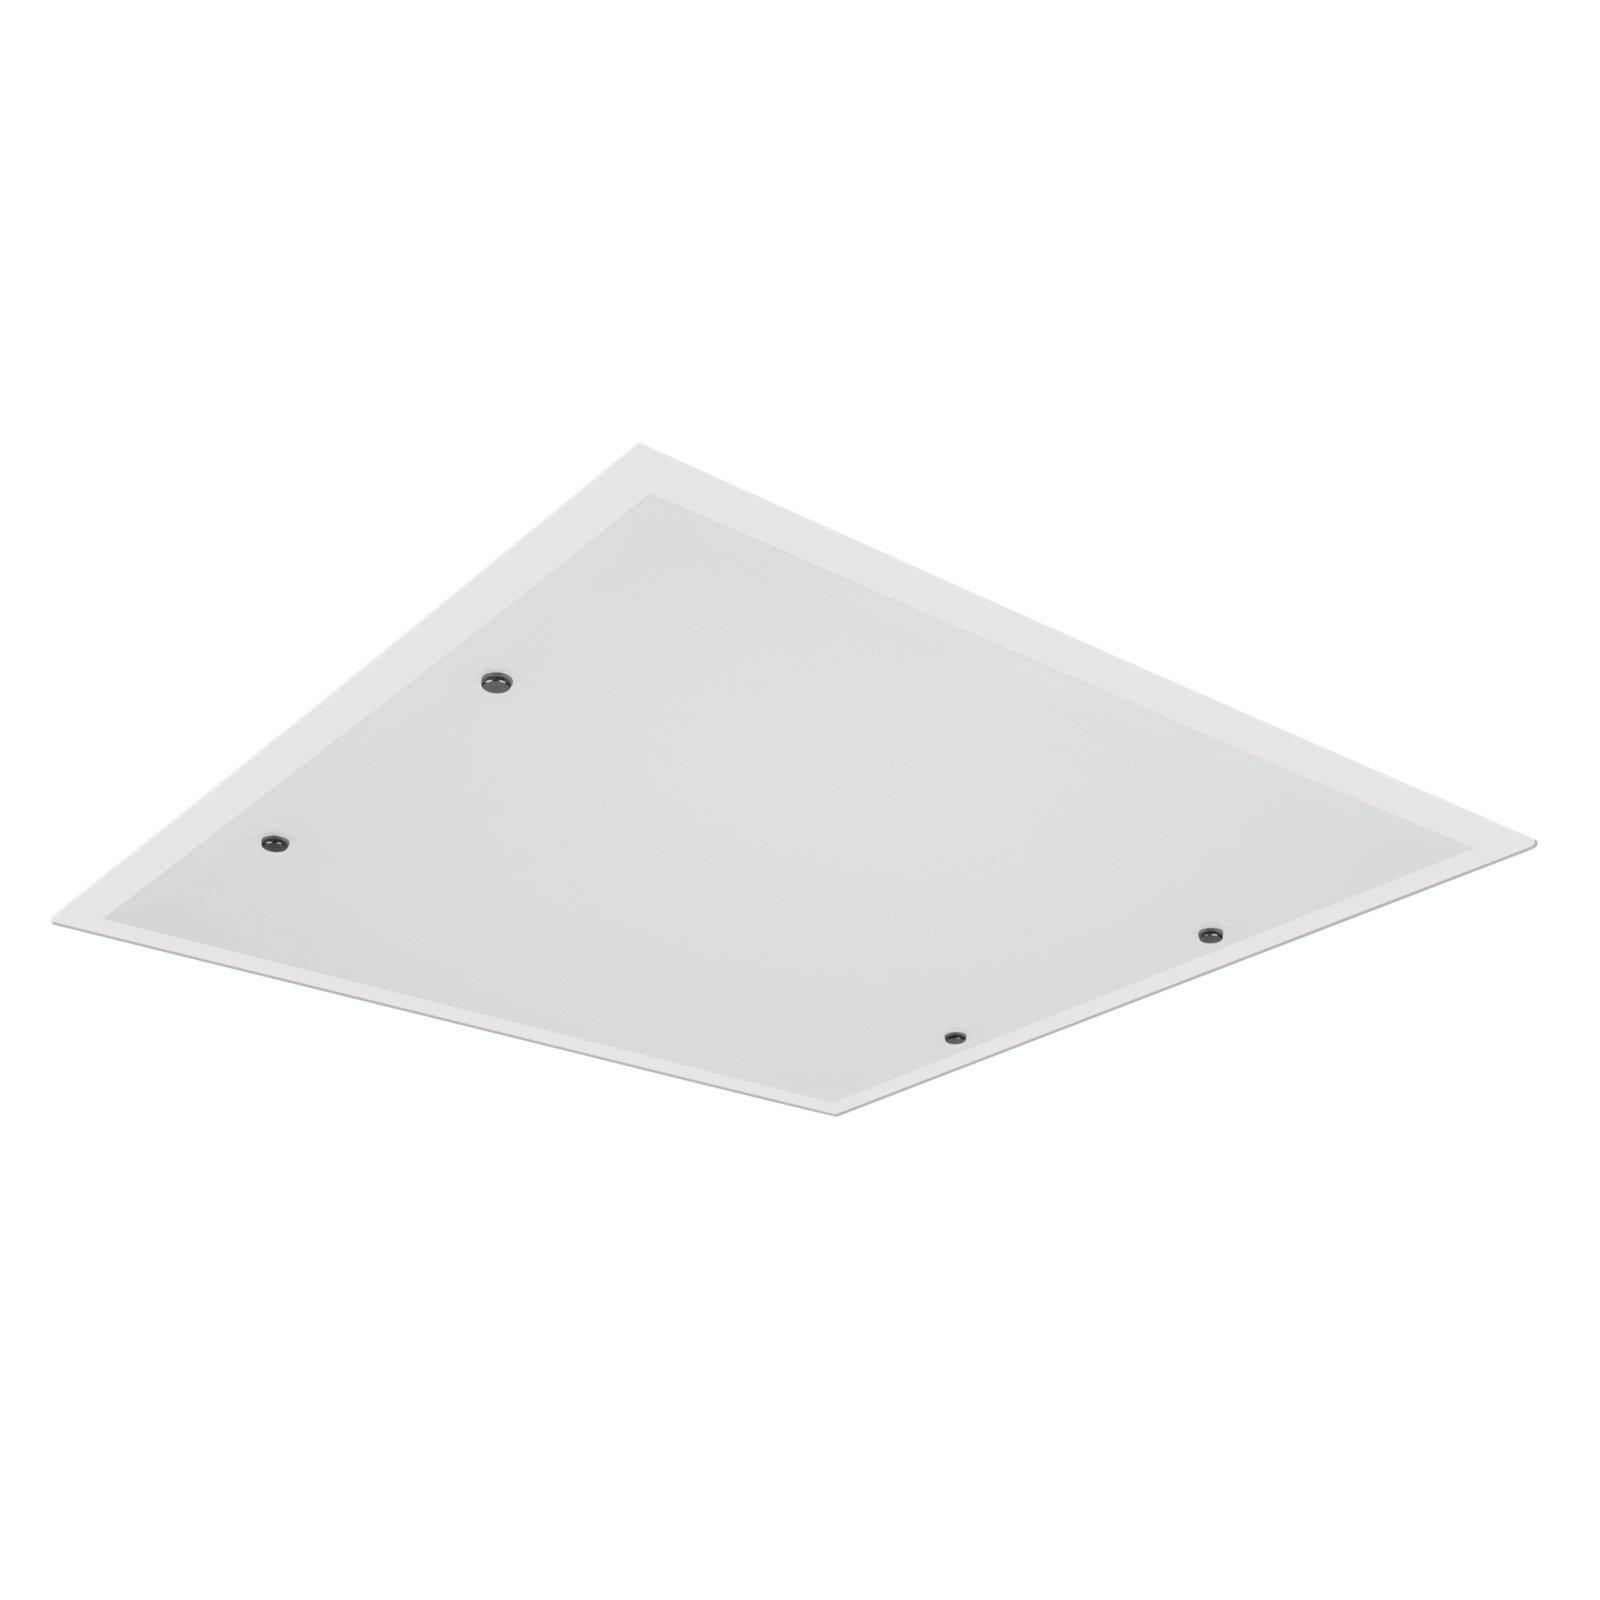 LEDVANCE Lunive Area LED-taklampe 40 cm, 4 000 K